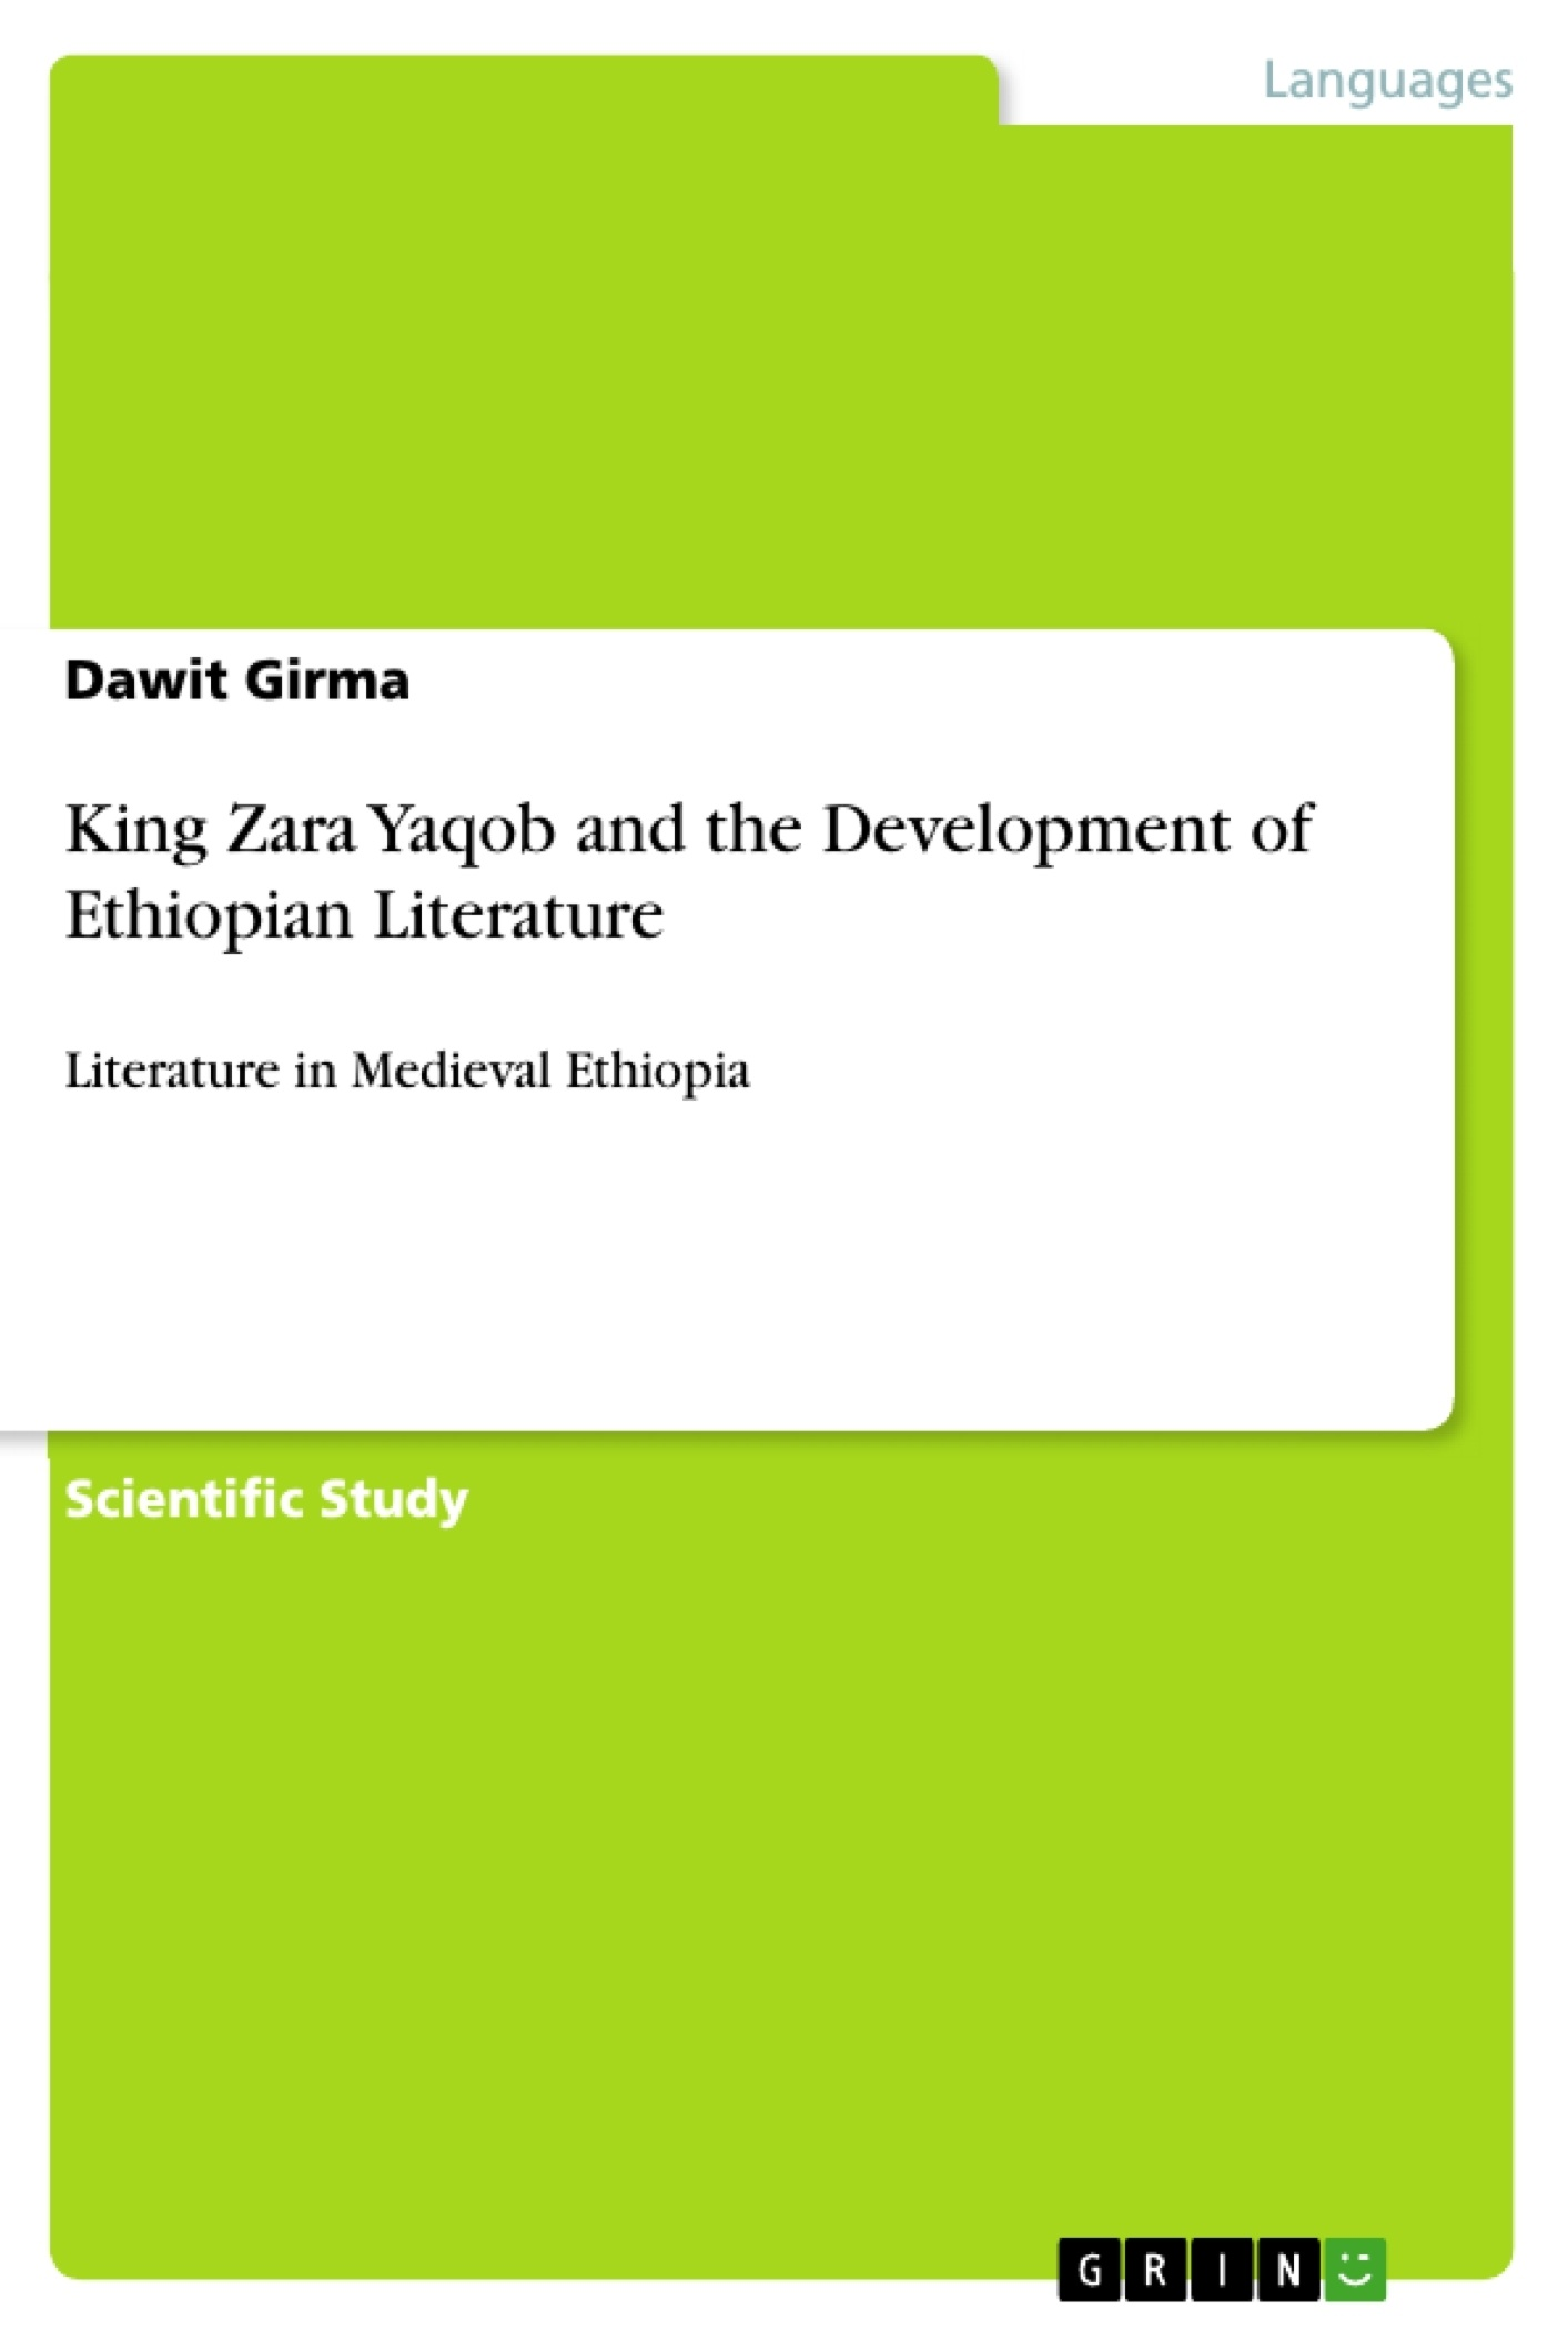 Title: King Zara Yaqob and the Development of Ethiopian Literature